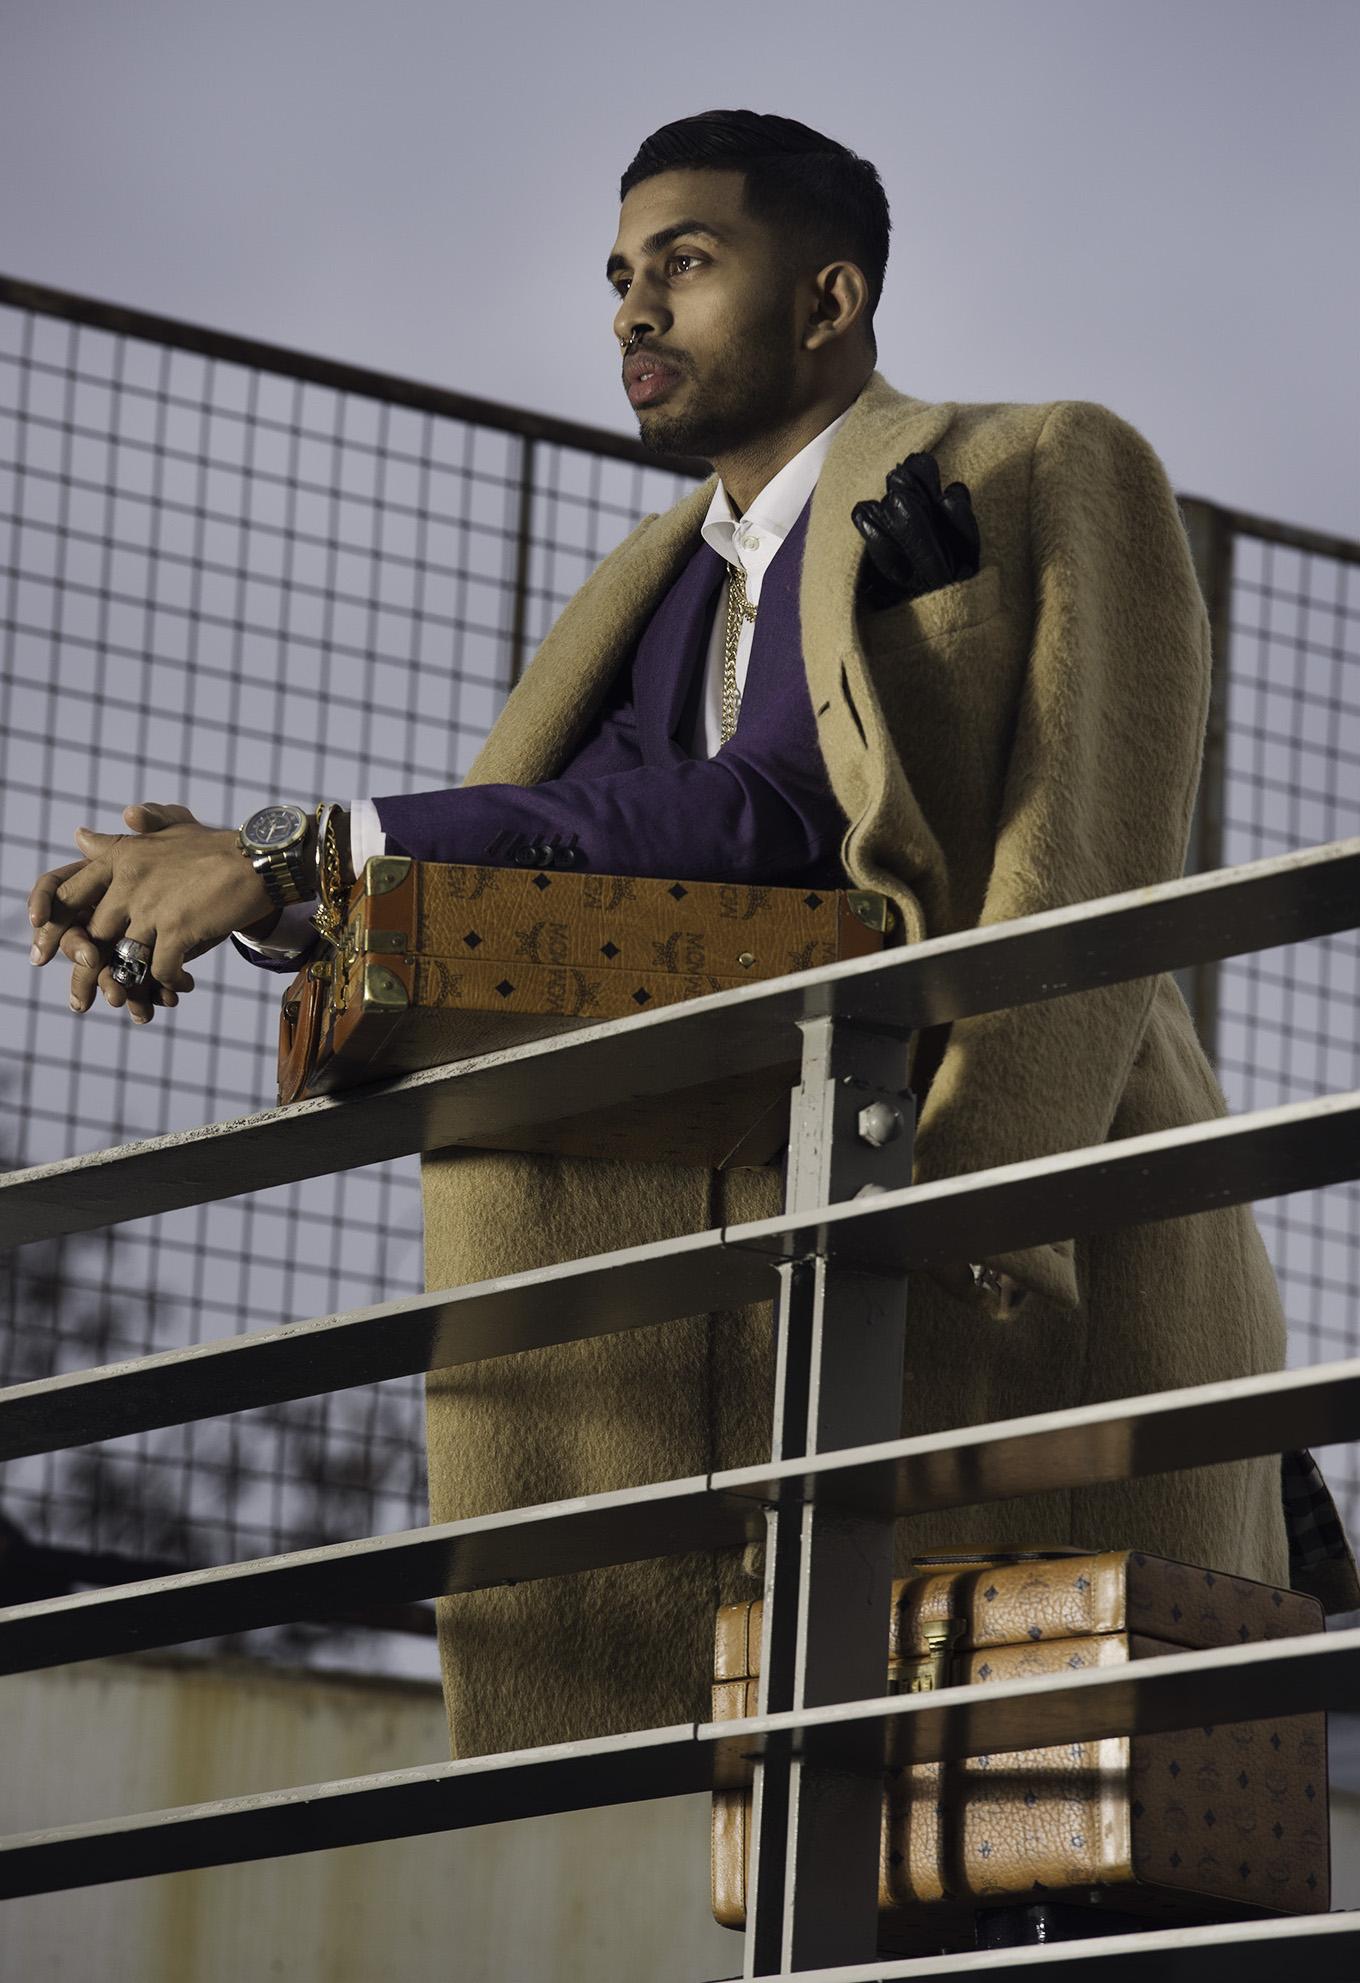 LAPADA+THAD+Purple+suit+balcany+0195.jpg